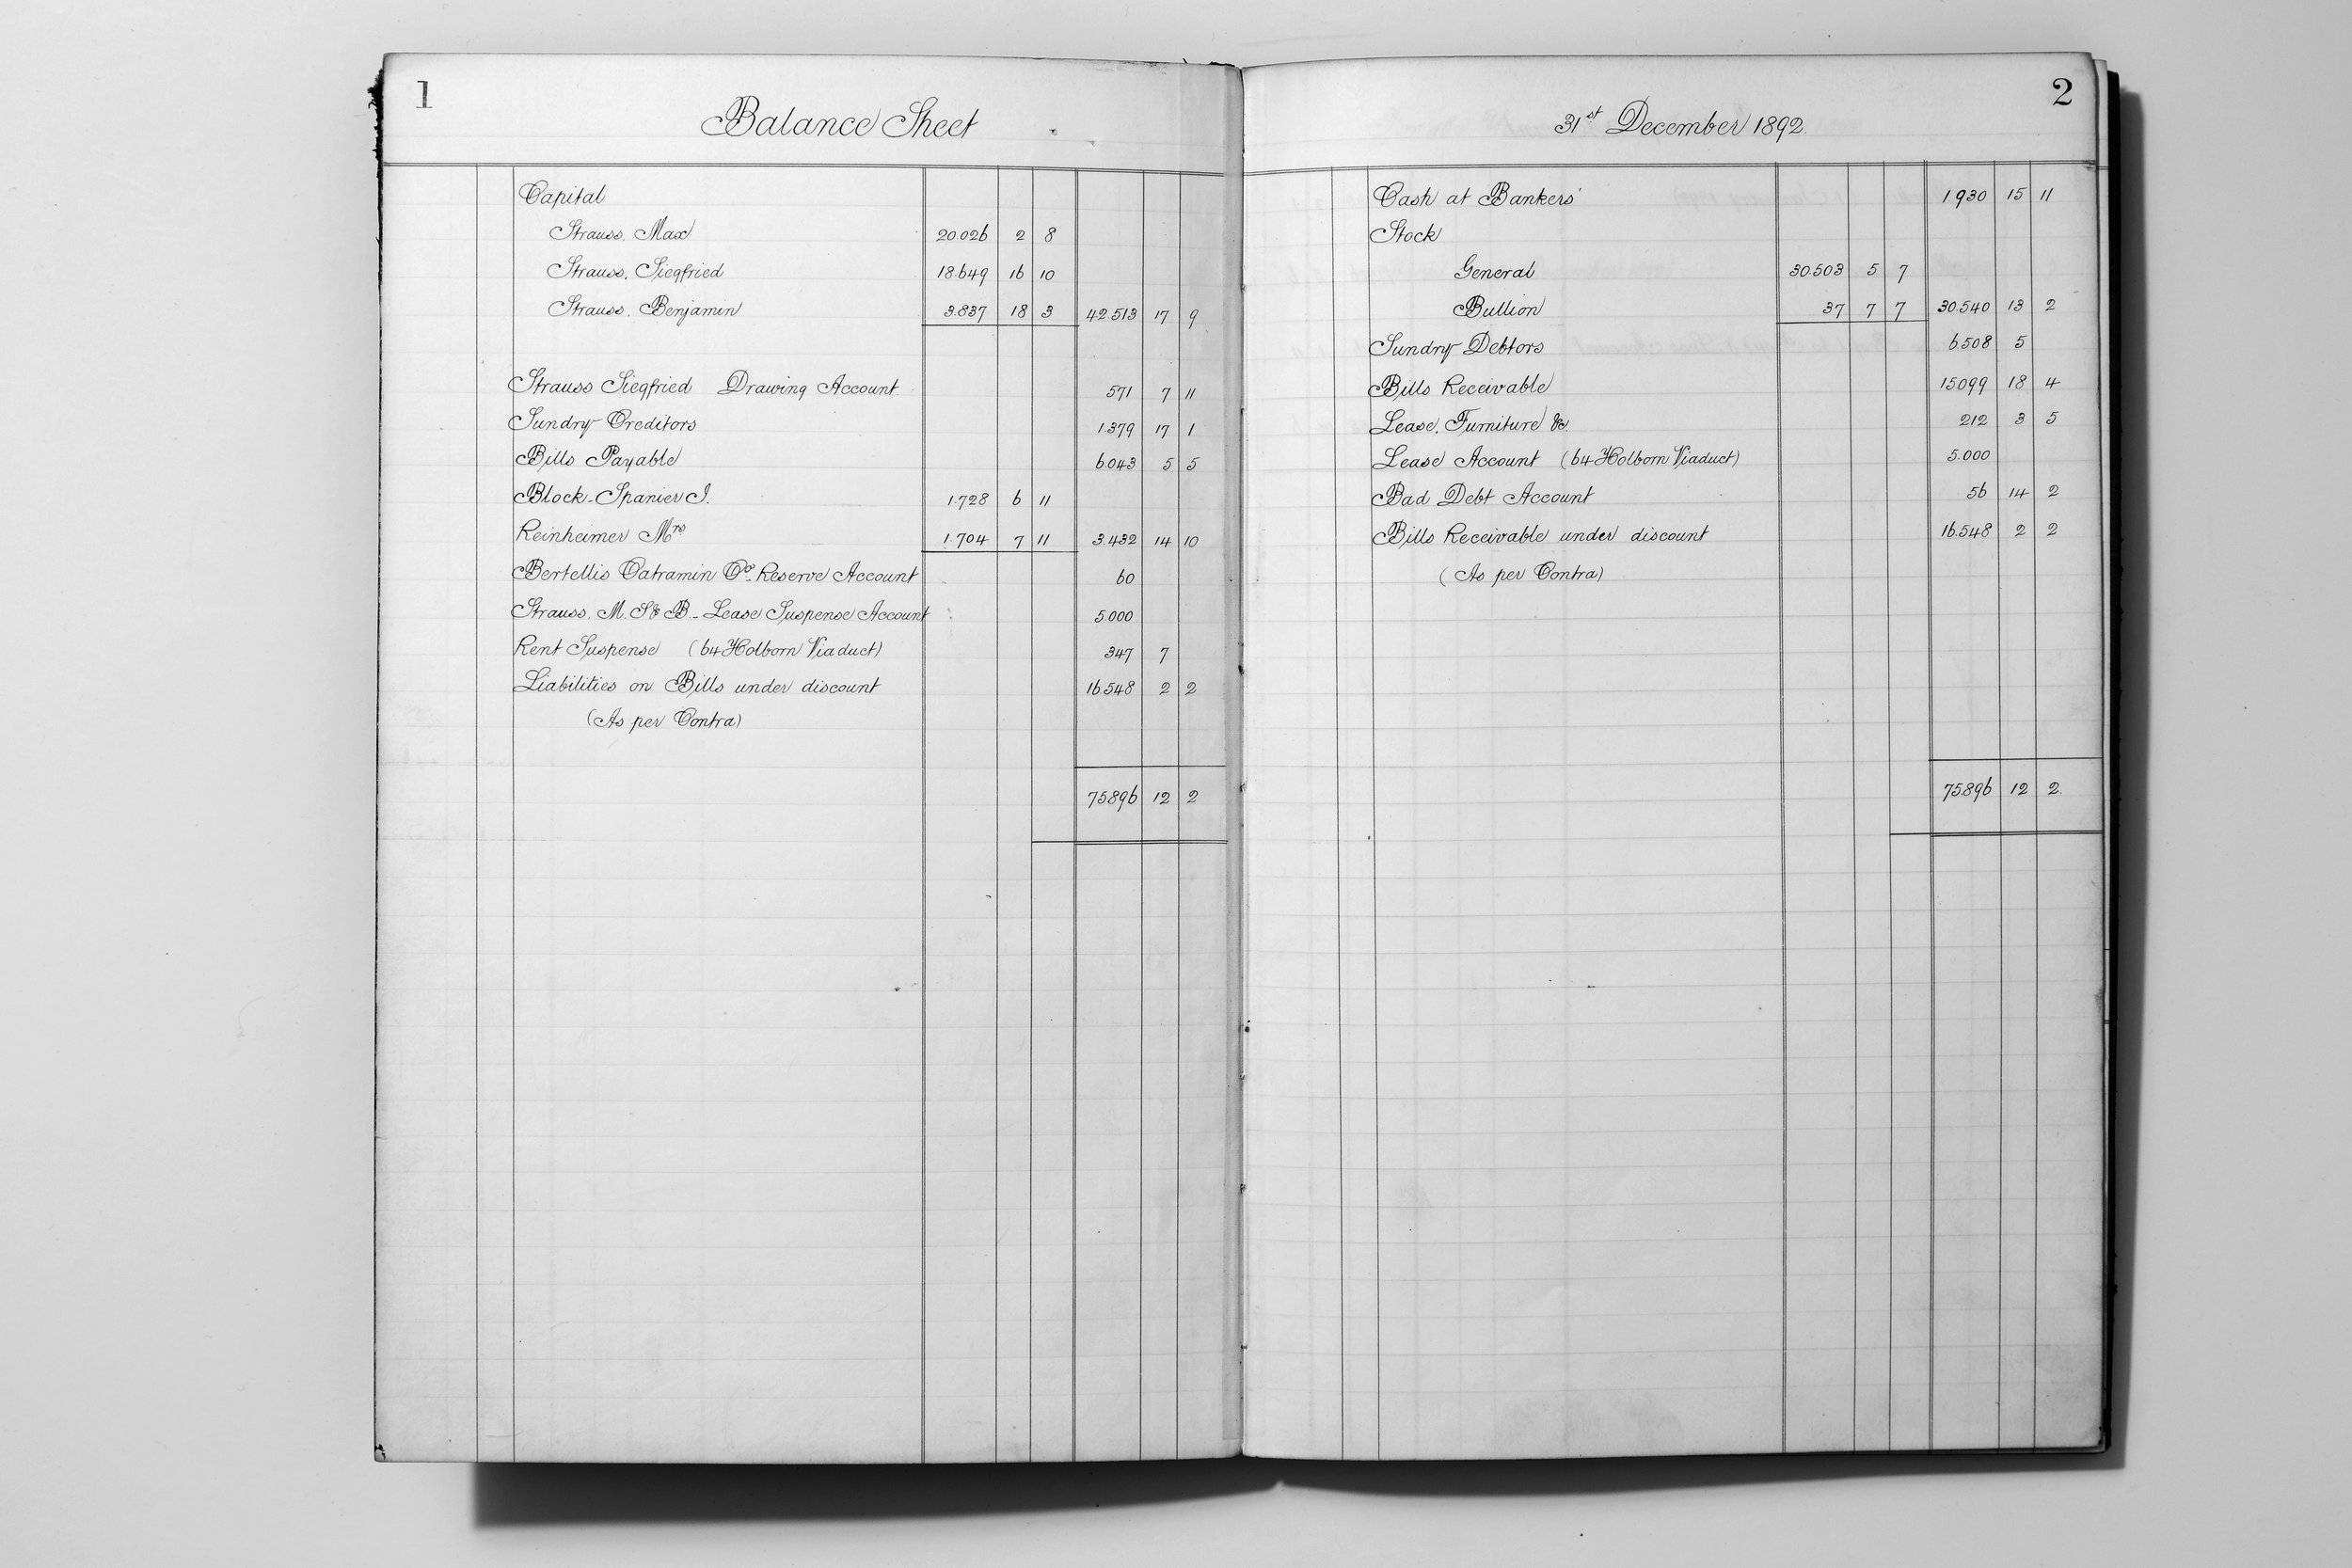 Backes & Strauss Balance Sheet